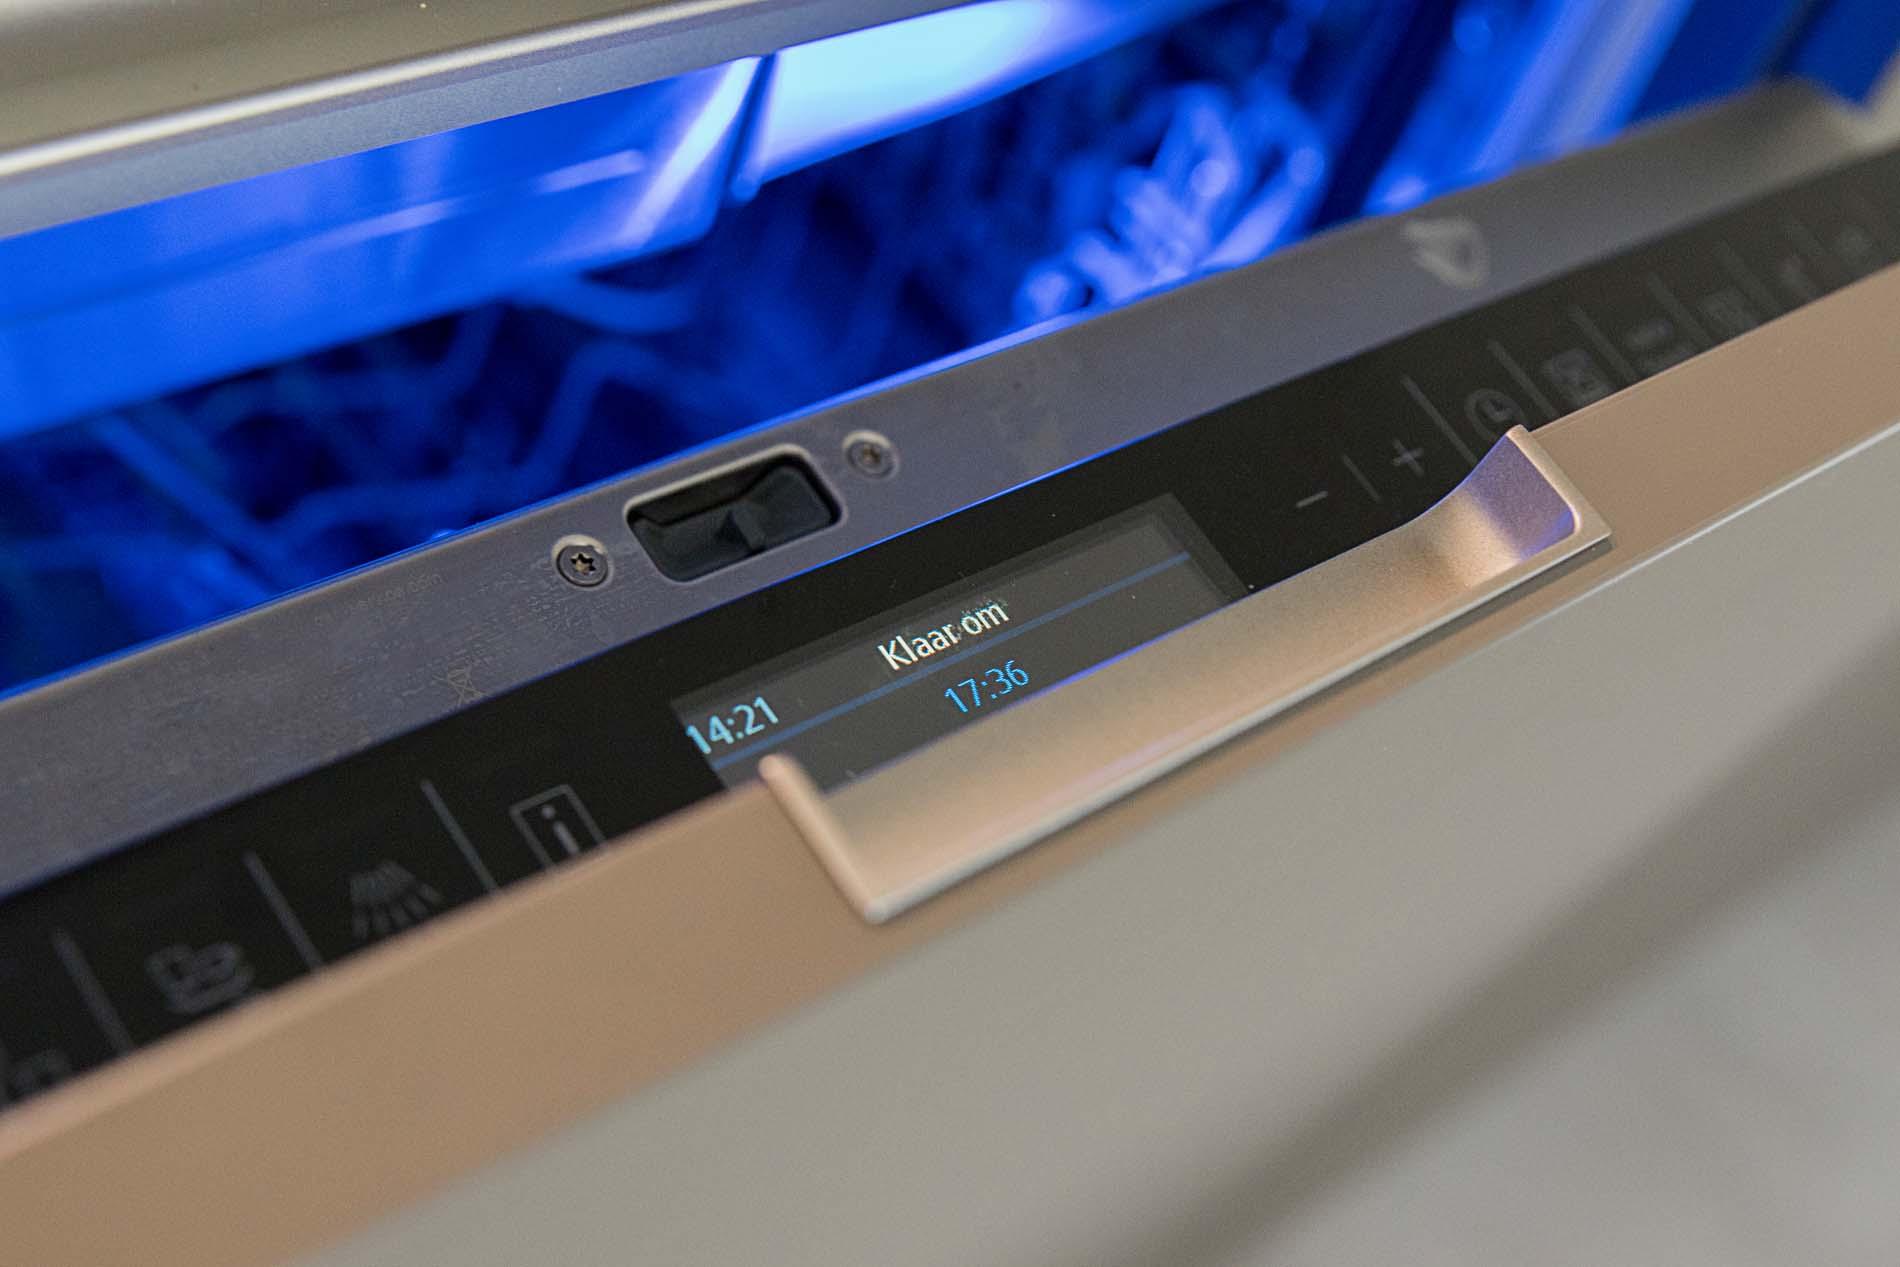 Siemens Vaatwasser met varioSpeed Plus, Keukenapparatuur ASWA Keukens